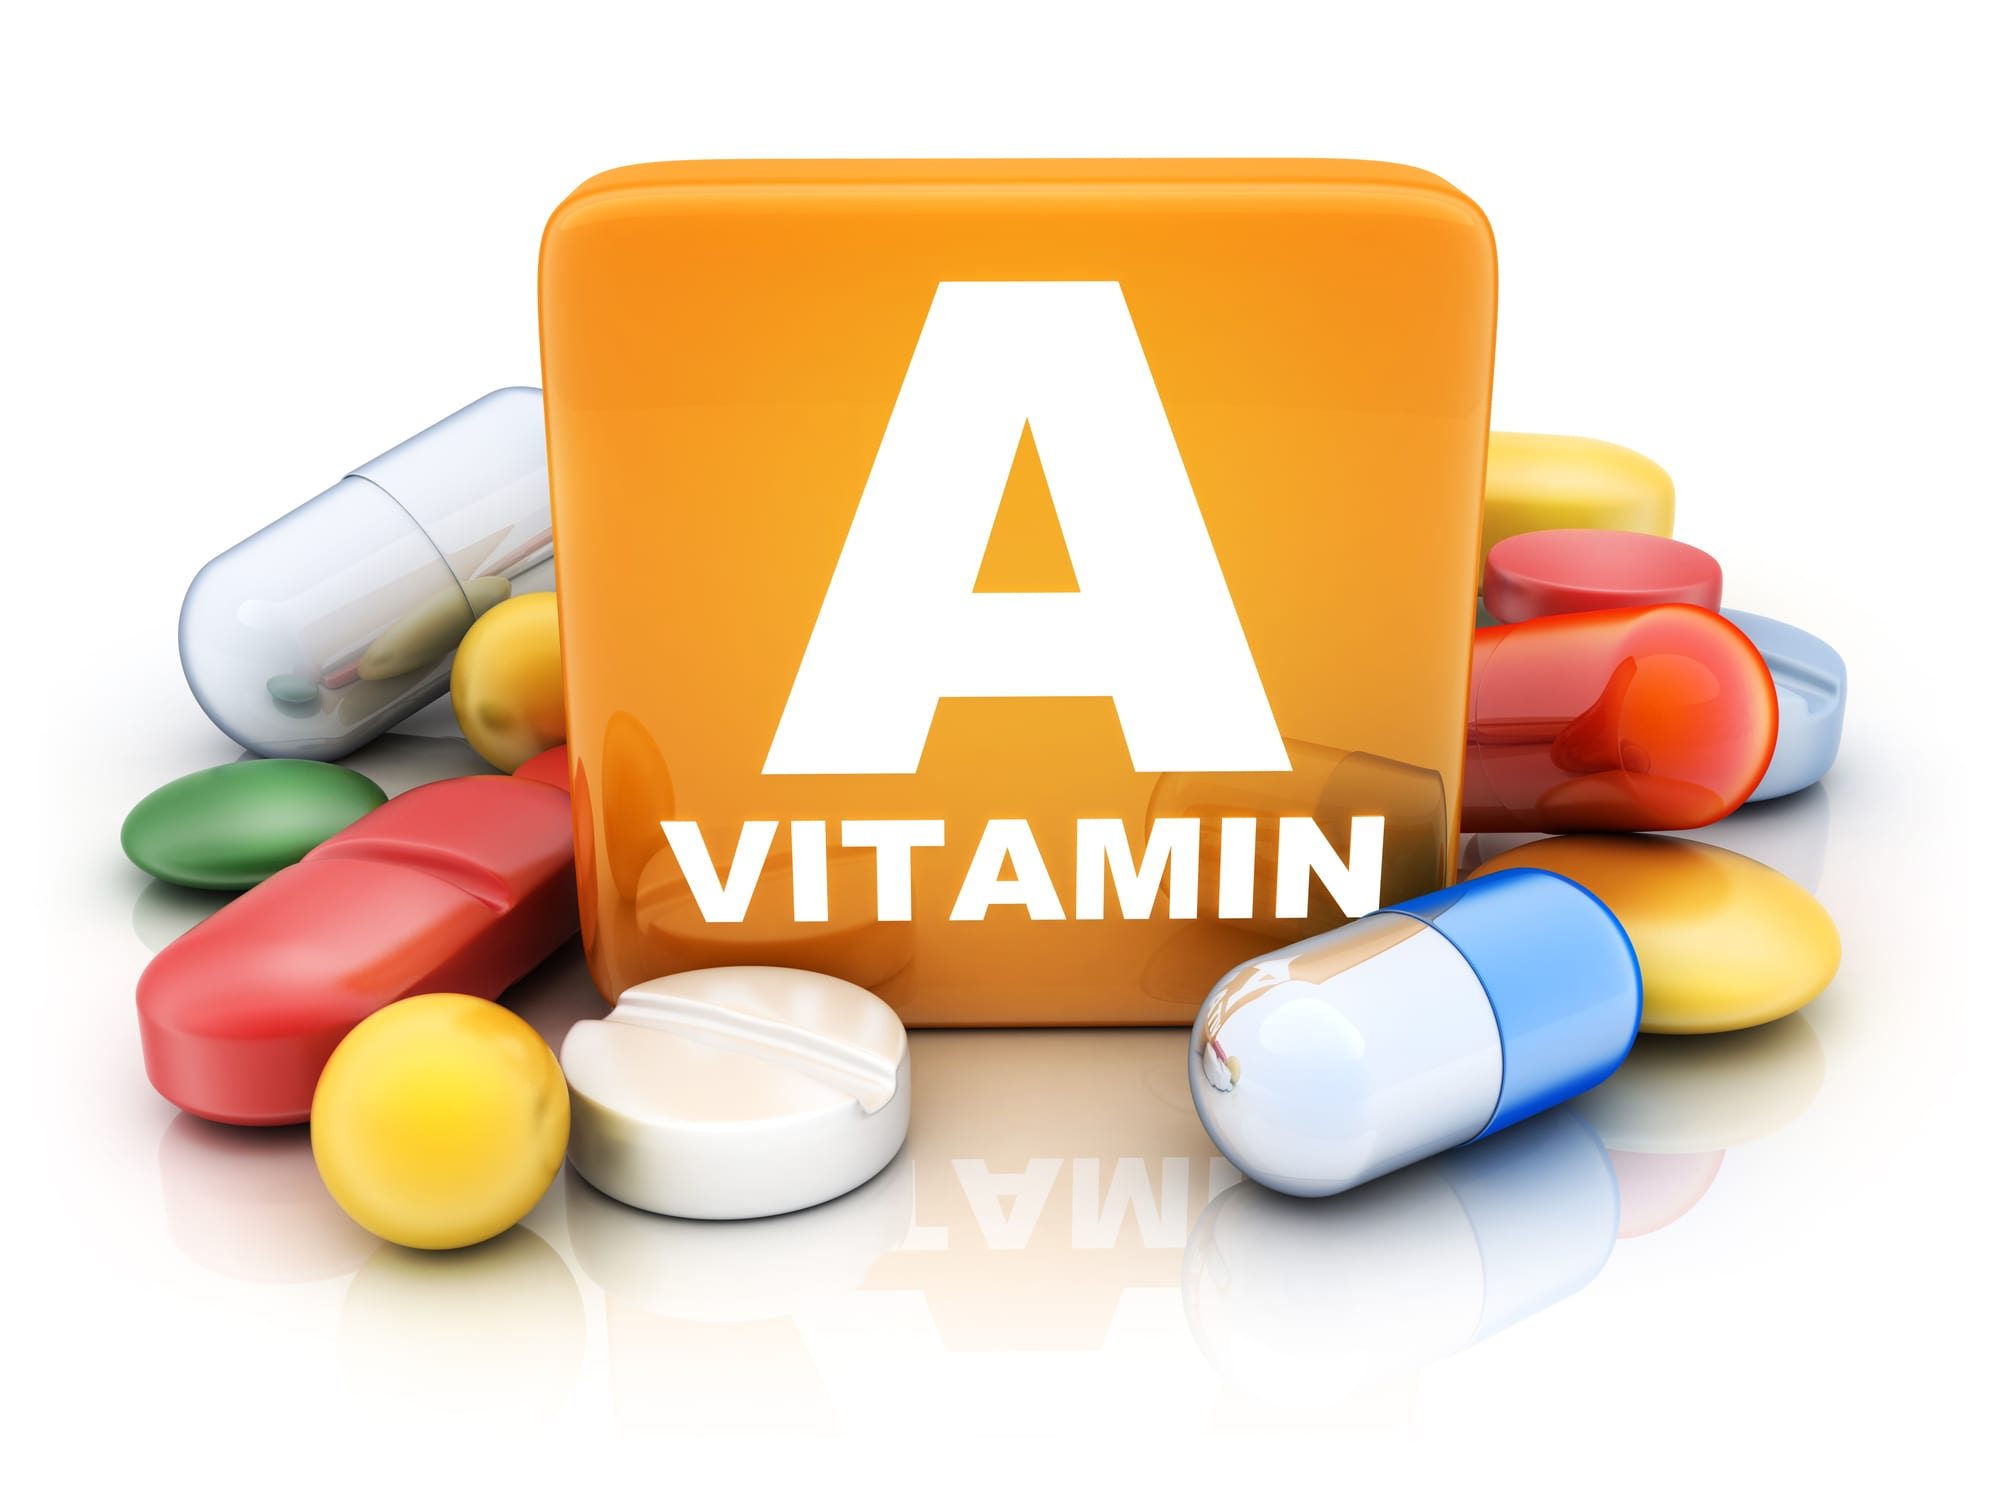 retinoids - Vitamin A